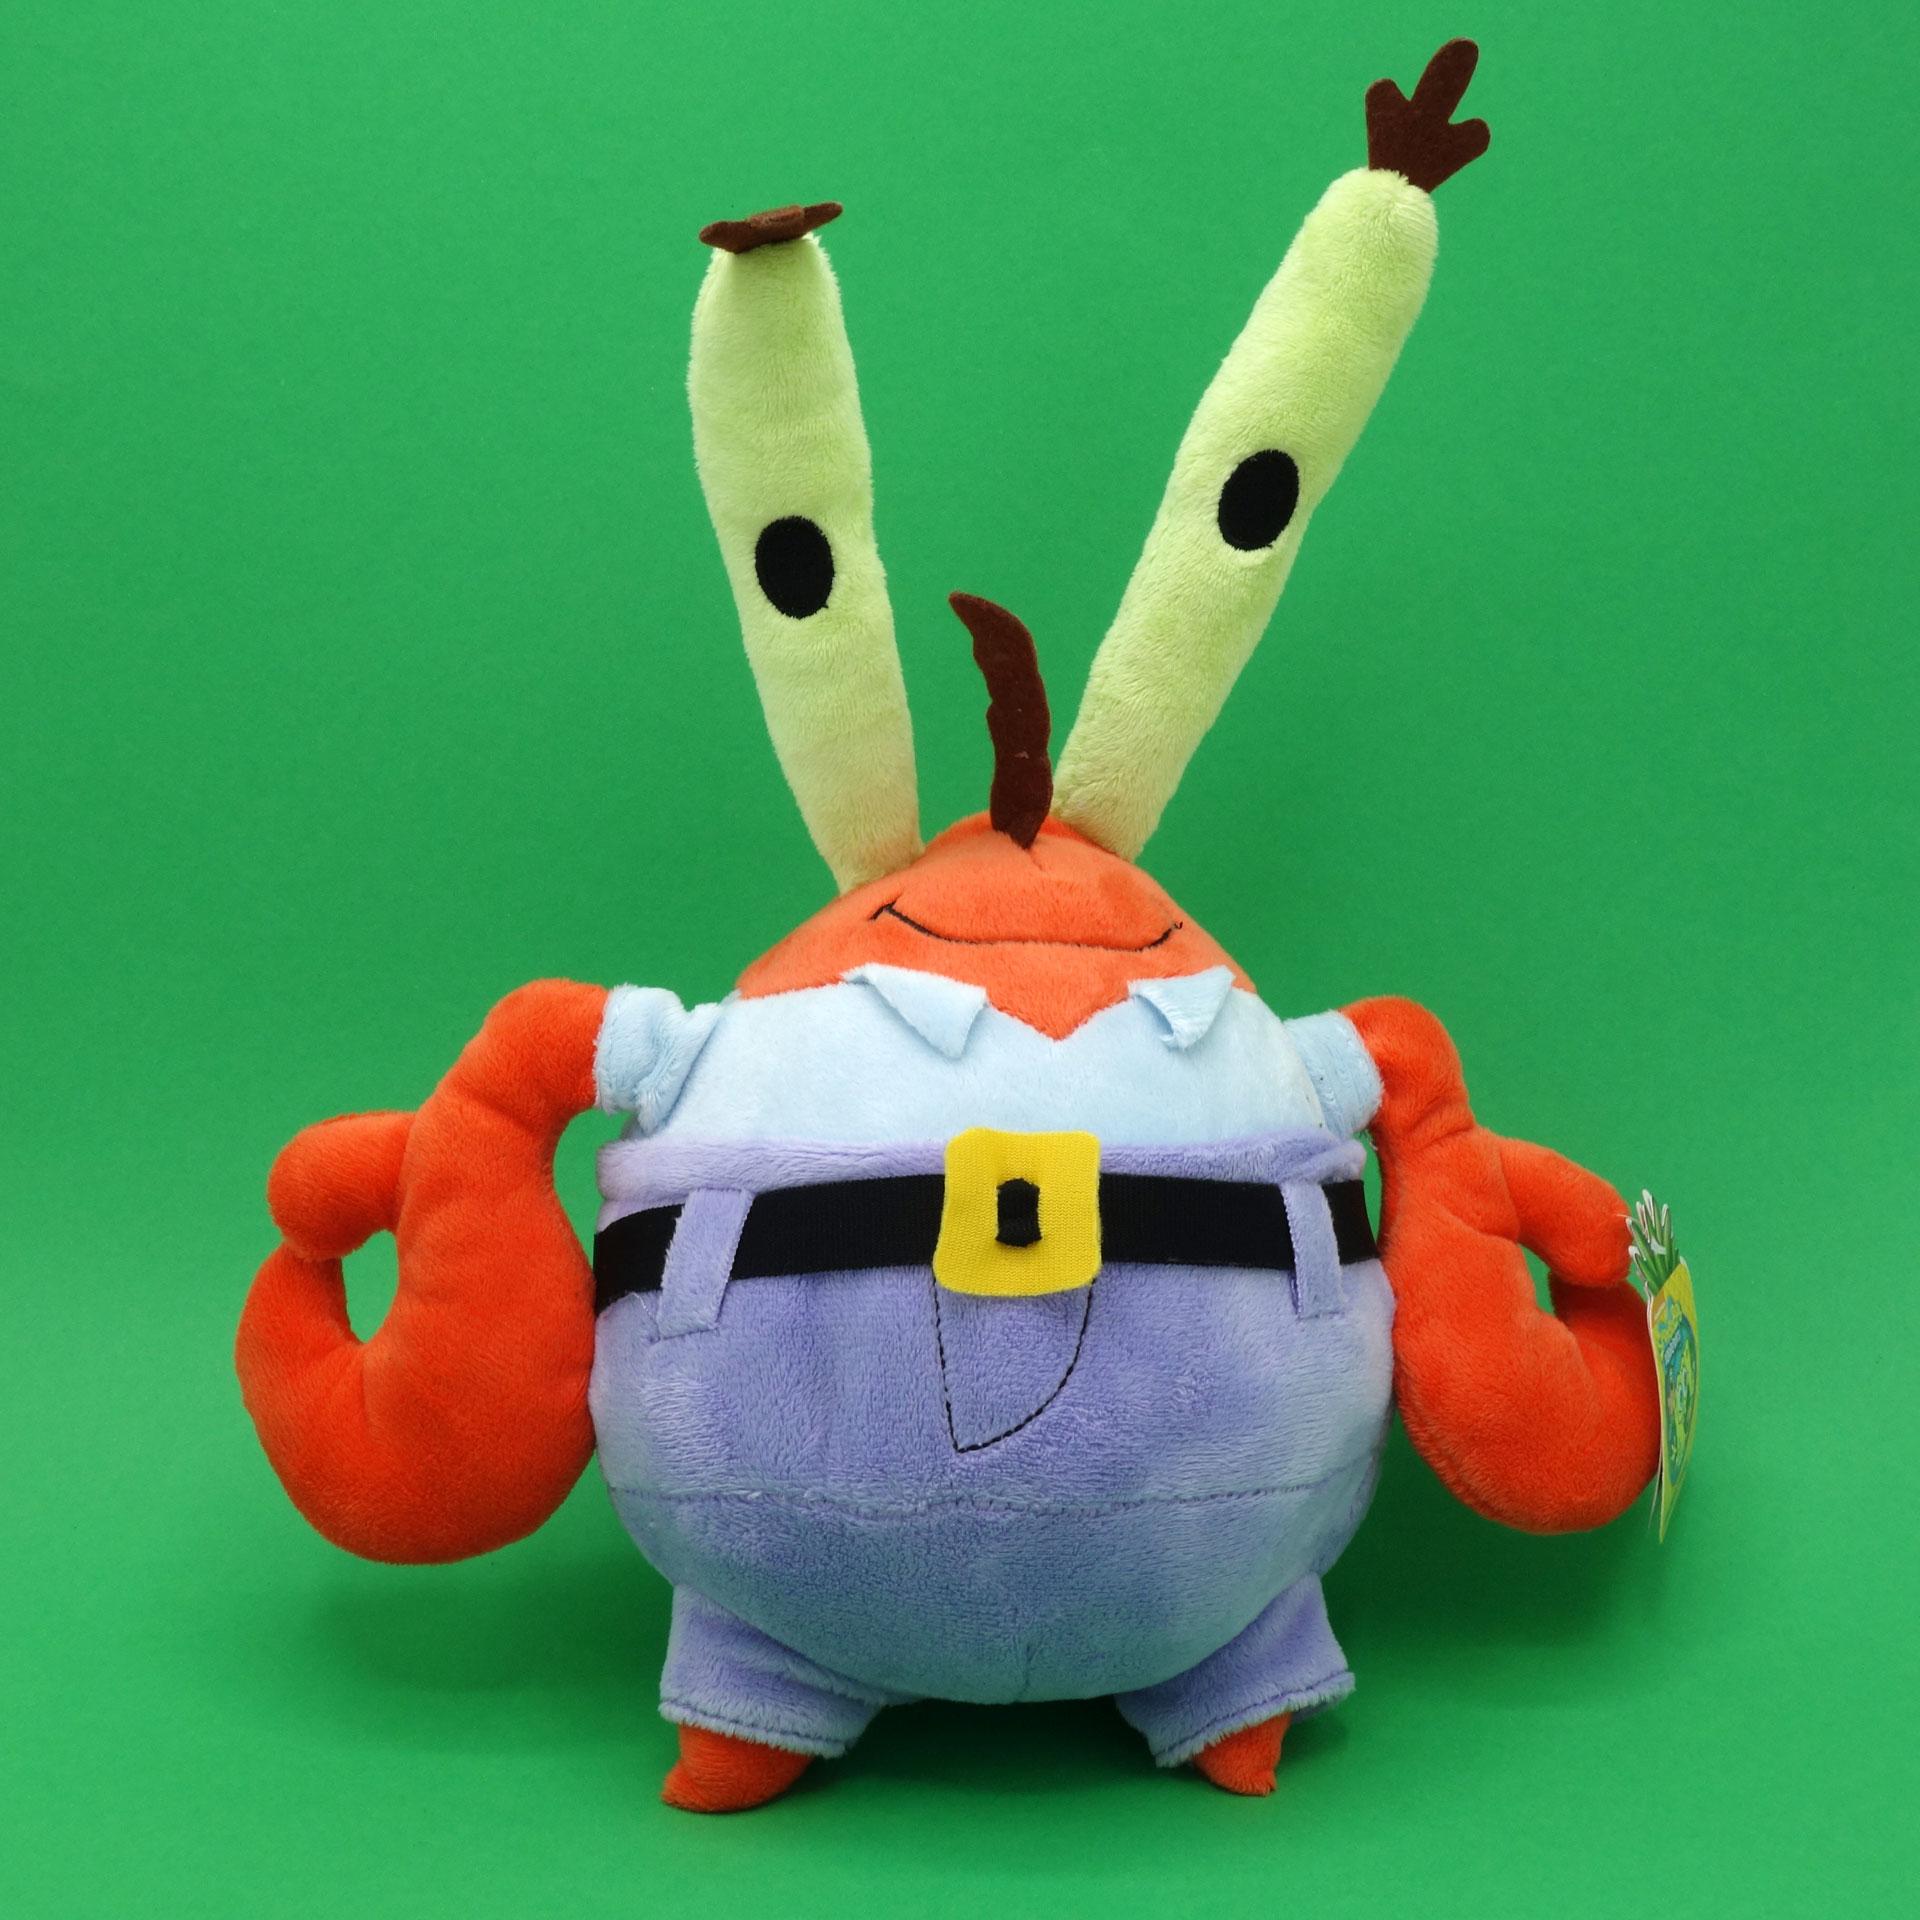 SpongeBob Mr. Krabs Eugene H. Krabs Plüsch